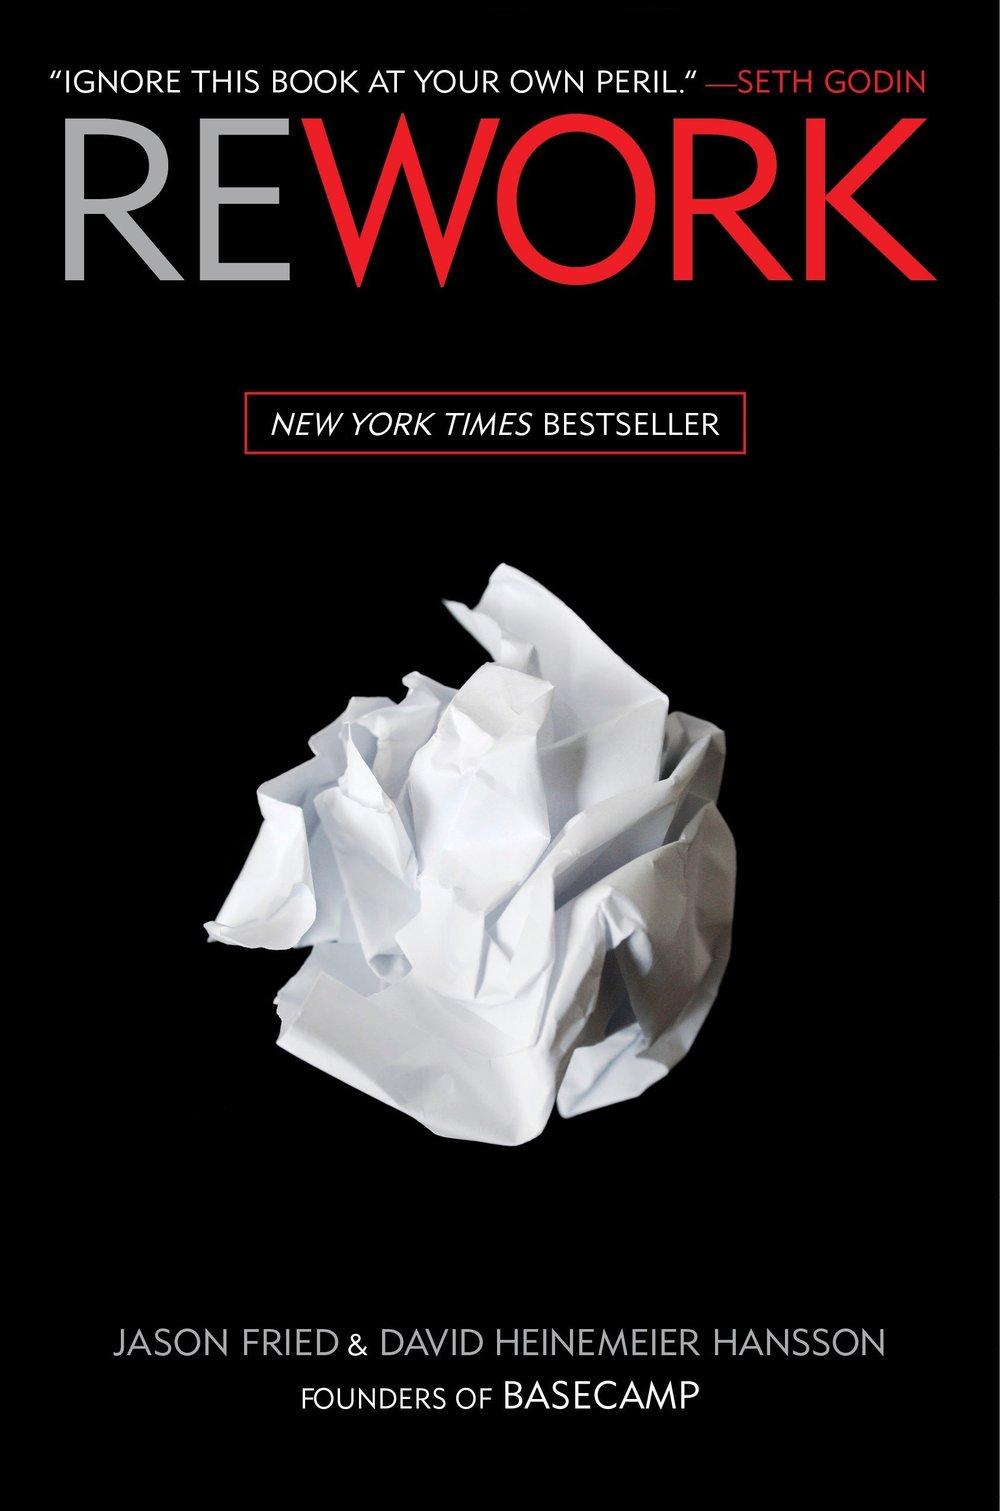 rework book cover.jpg